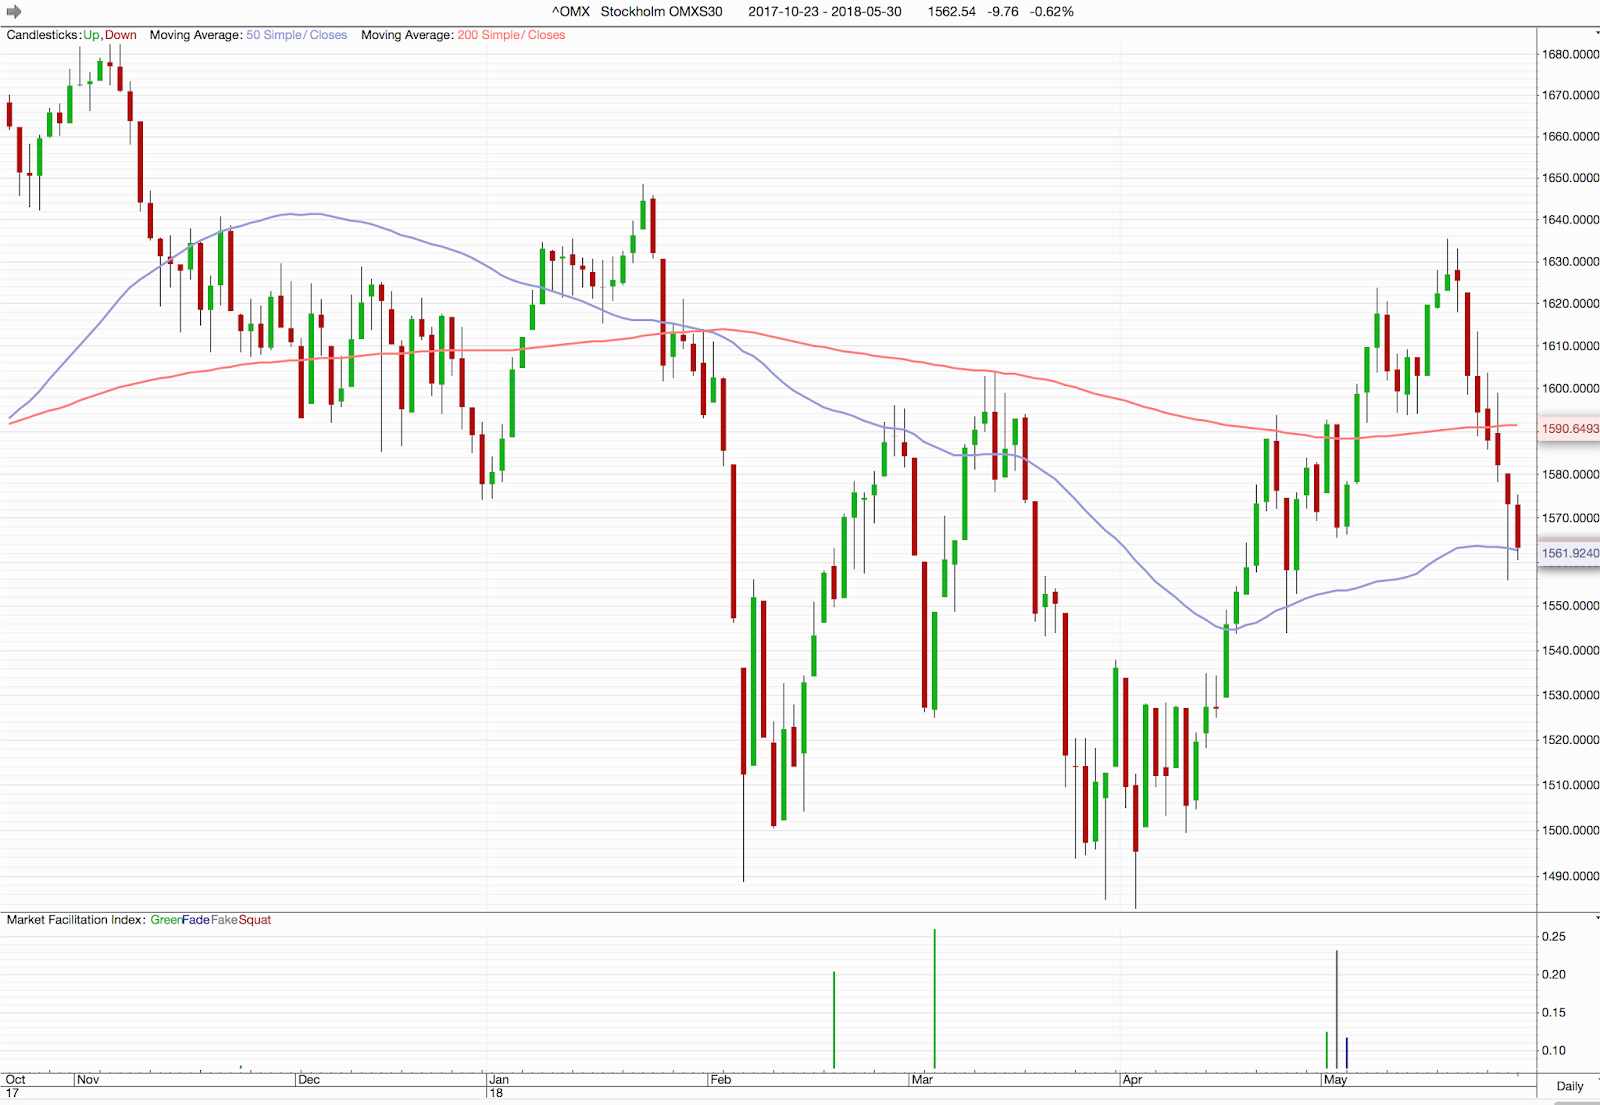 Cornucopia   Börsen ner sju dagar på raken 10a4edfbd0e15